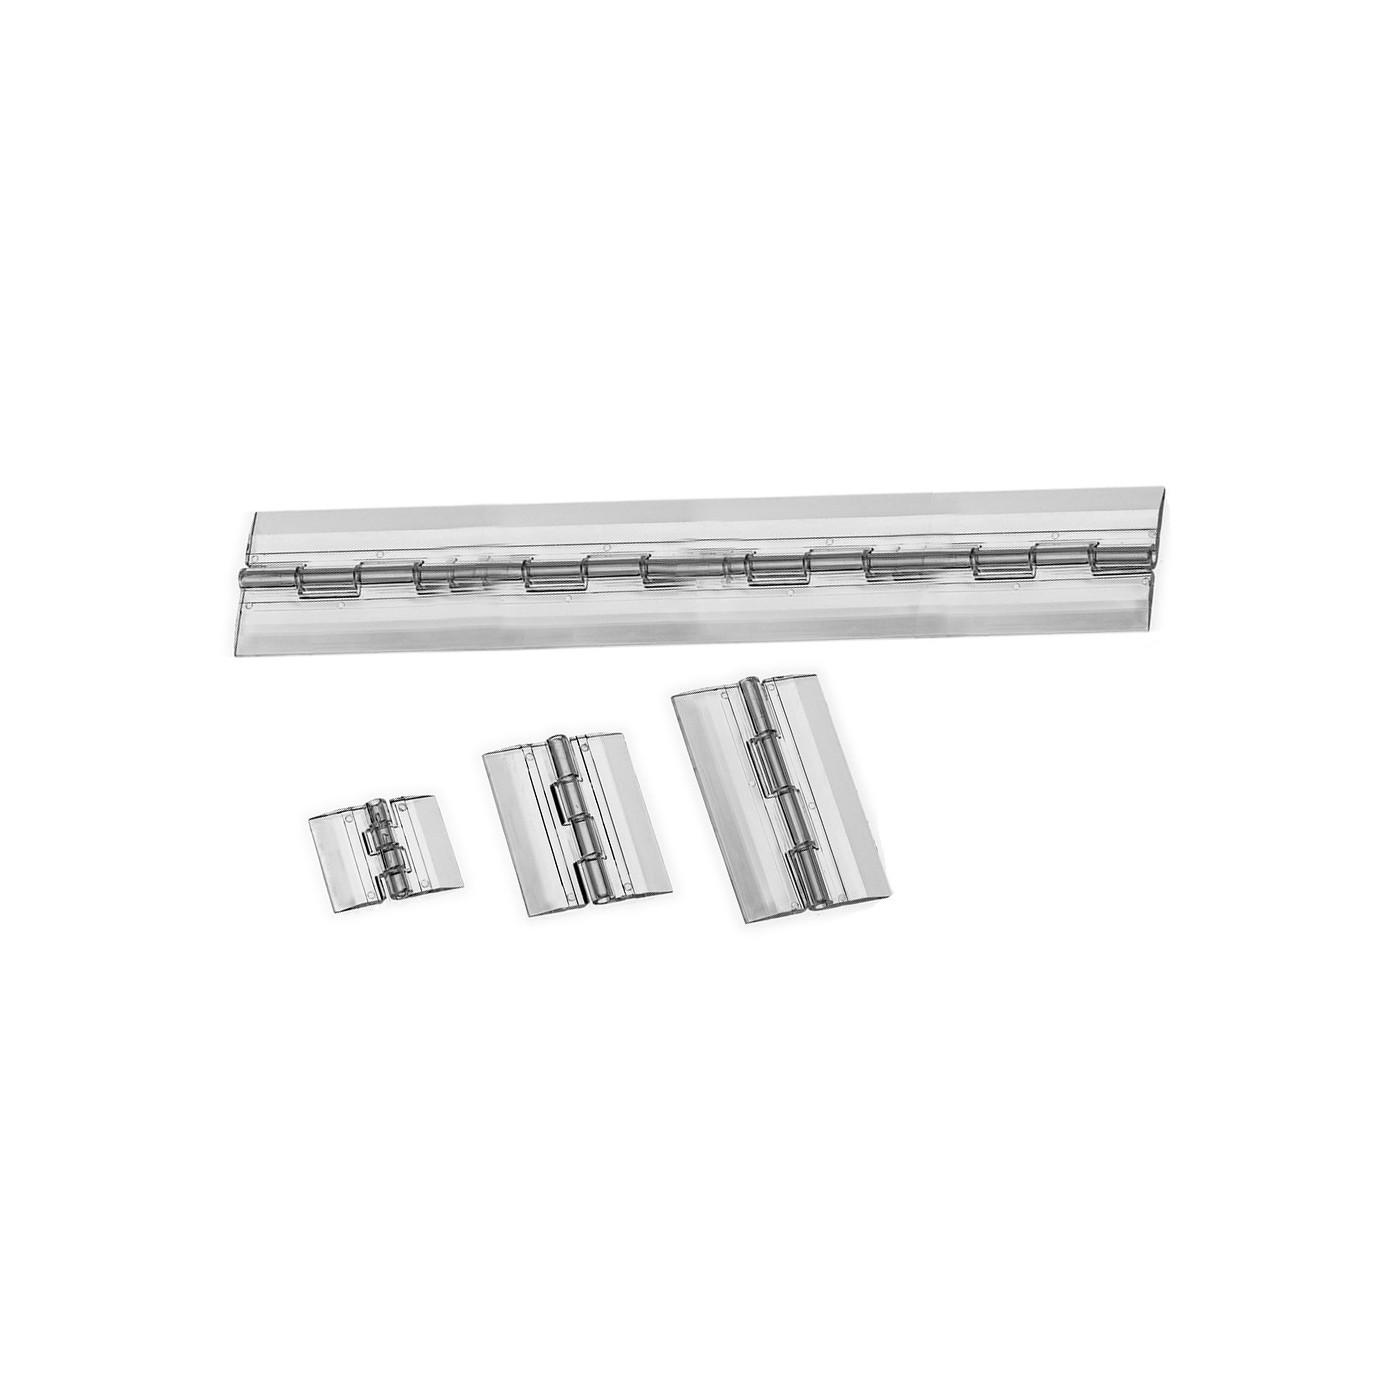 Set van 5 plastic scharnieren, transparant, 200x42 mm  - 1